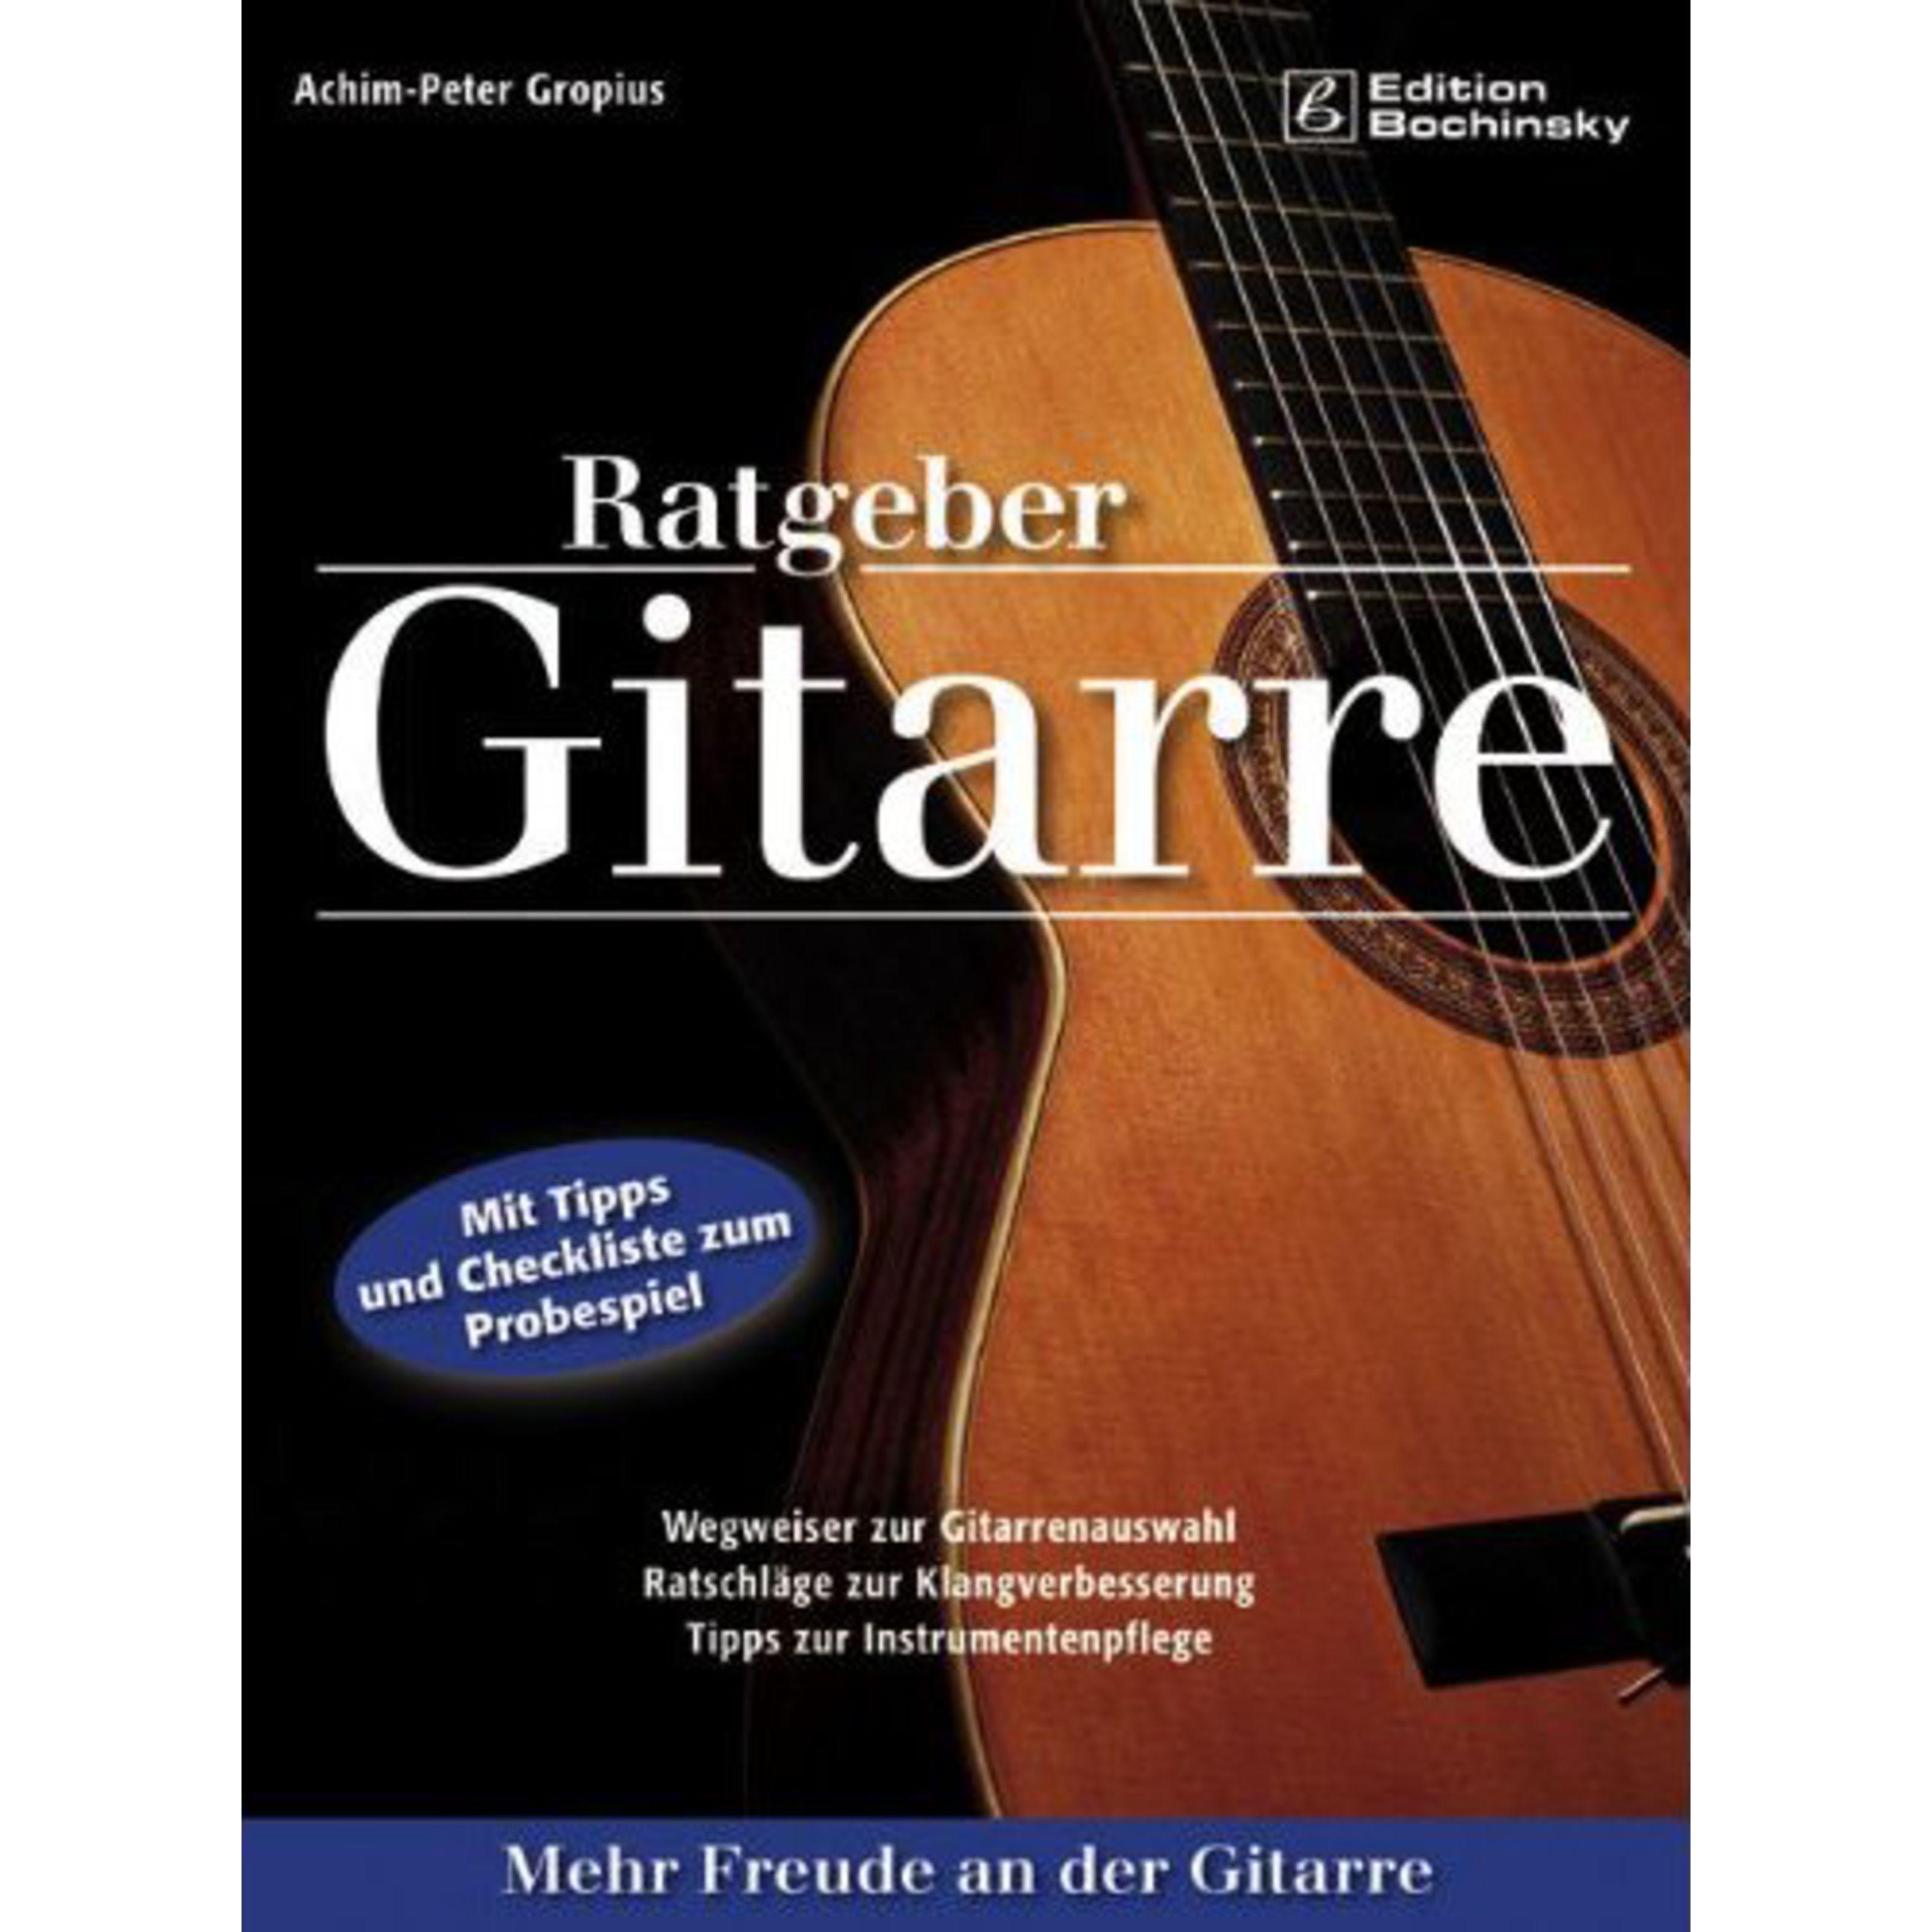 PPV Medien - Ratgeber Gitarre Achim Peter Gropius, Buch 20046354